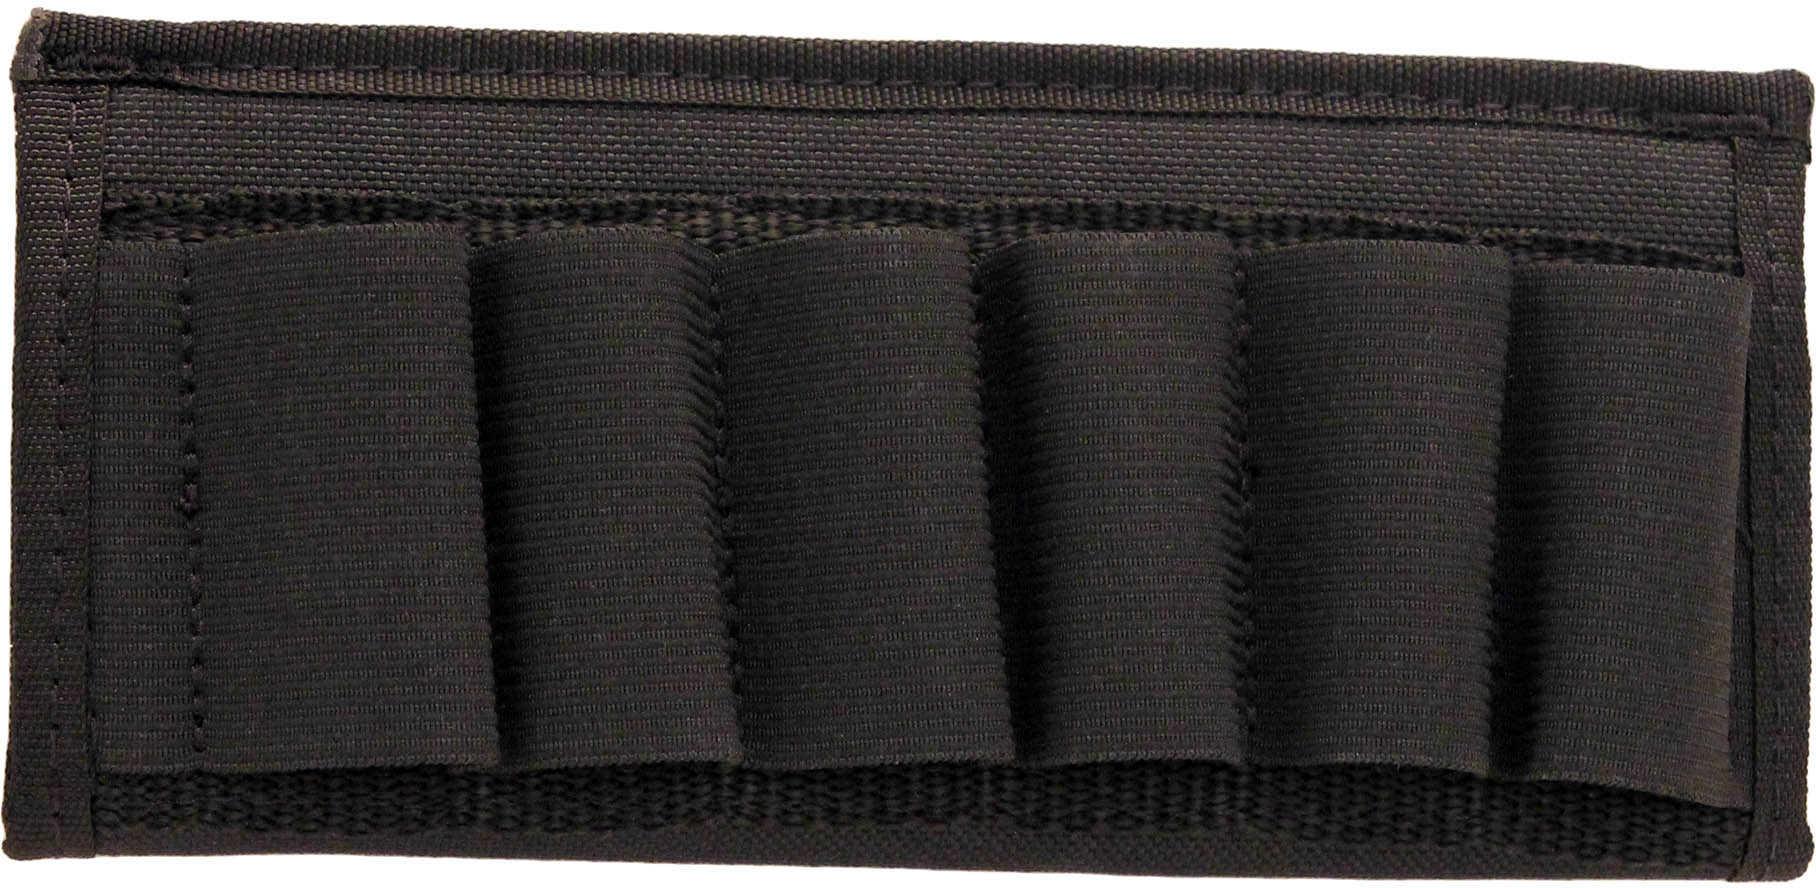 Grovtec USA Inc. Grovtec US Inc Cartridge Slide Holder Any Shotgun Ammunition Black Elastic/Nylon GTAC87